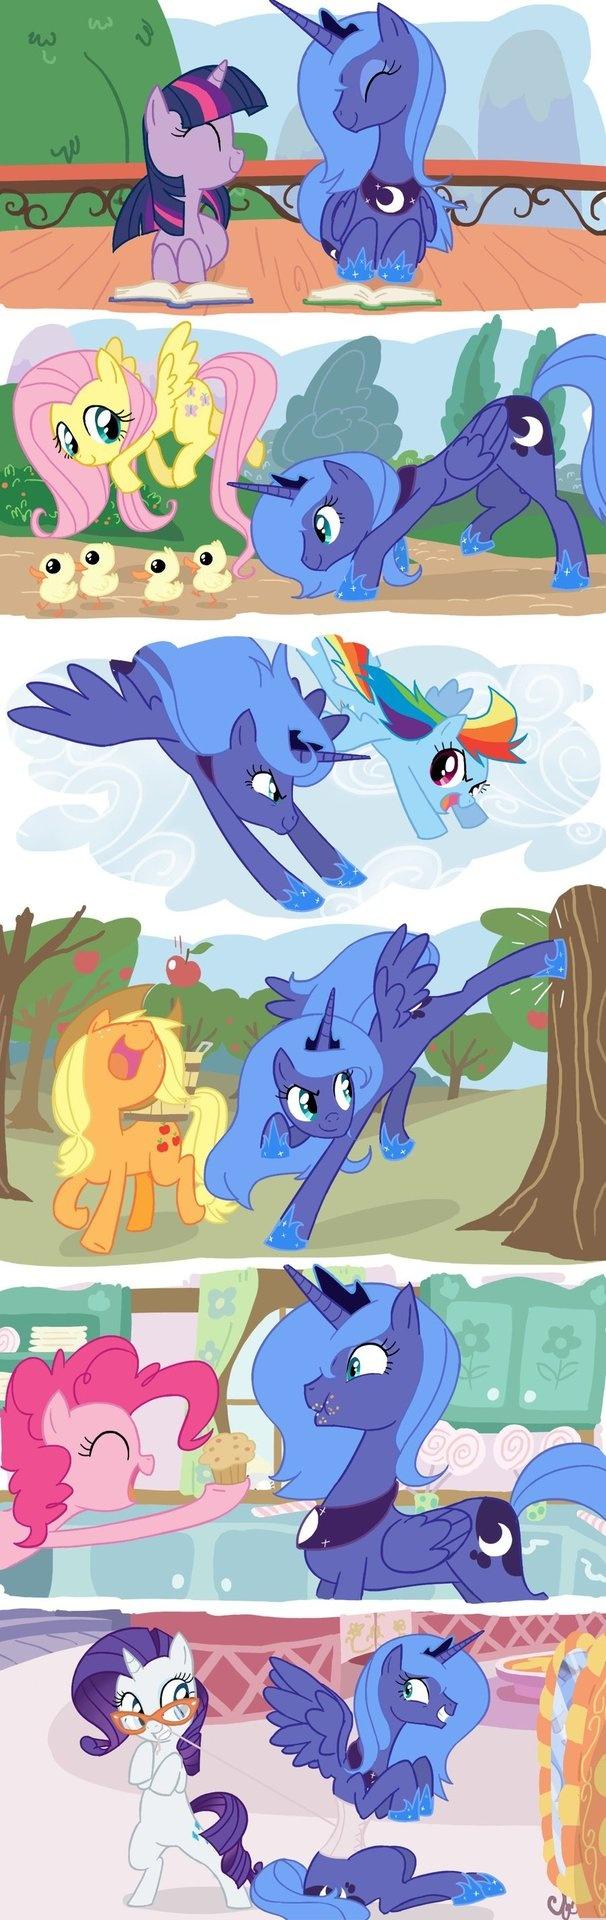 Luna's new friends...